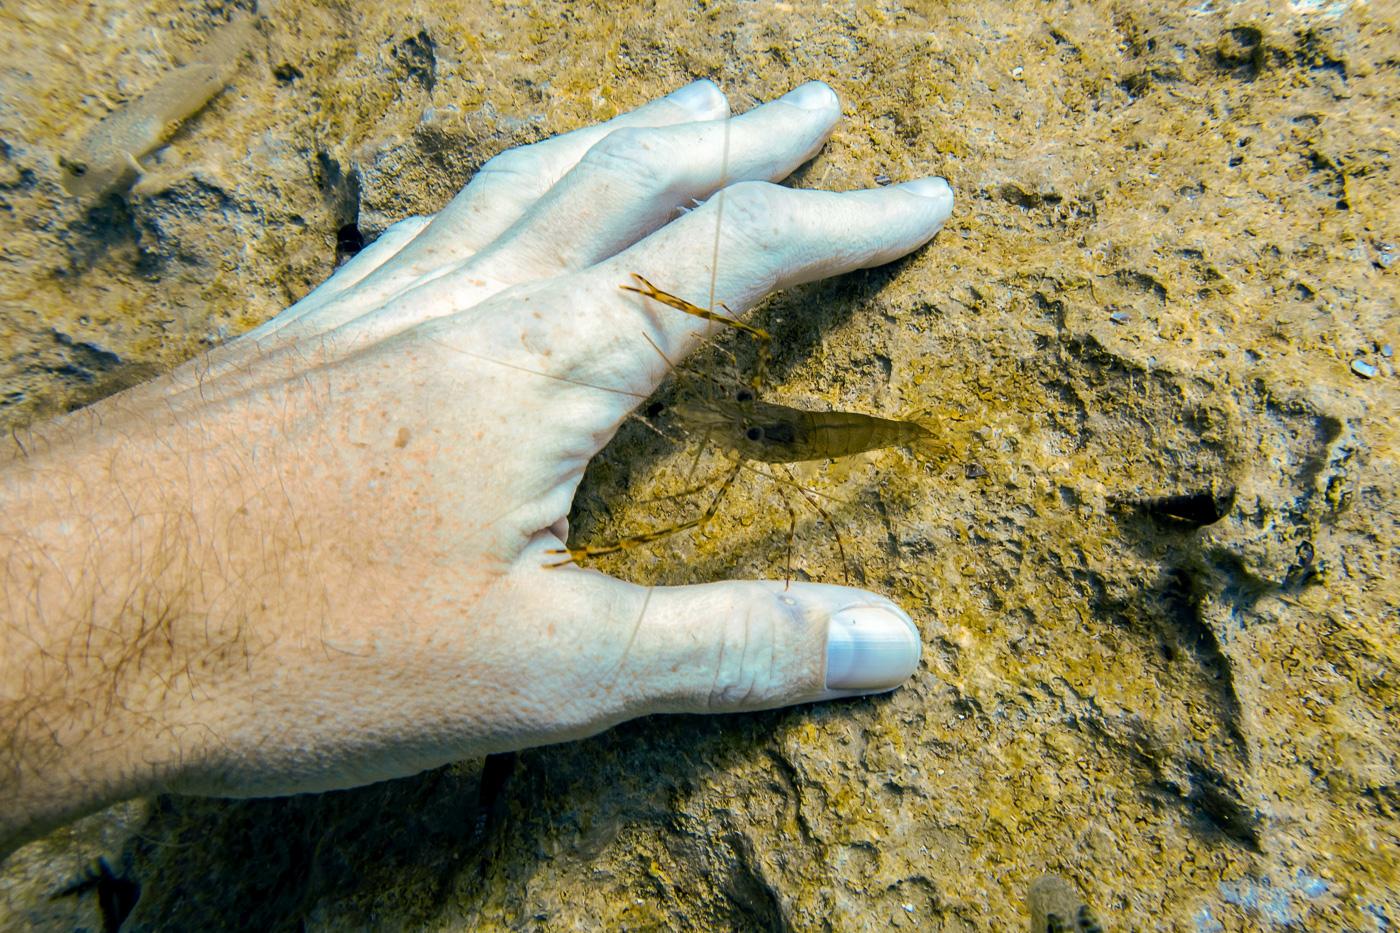 Diving Reefs and Wrecks in Coron, Palawan